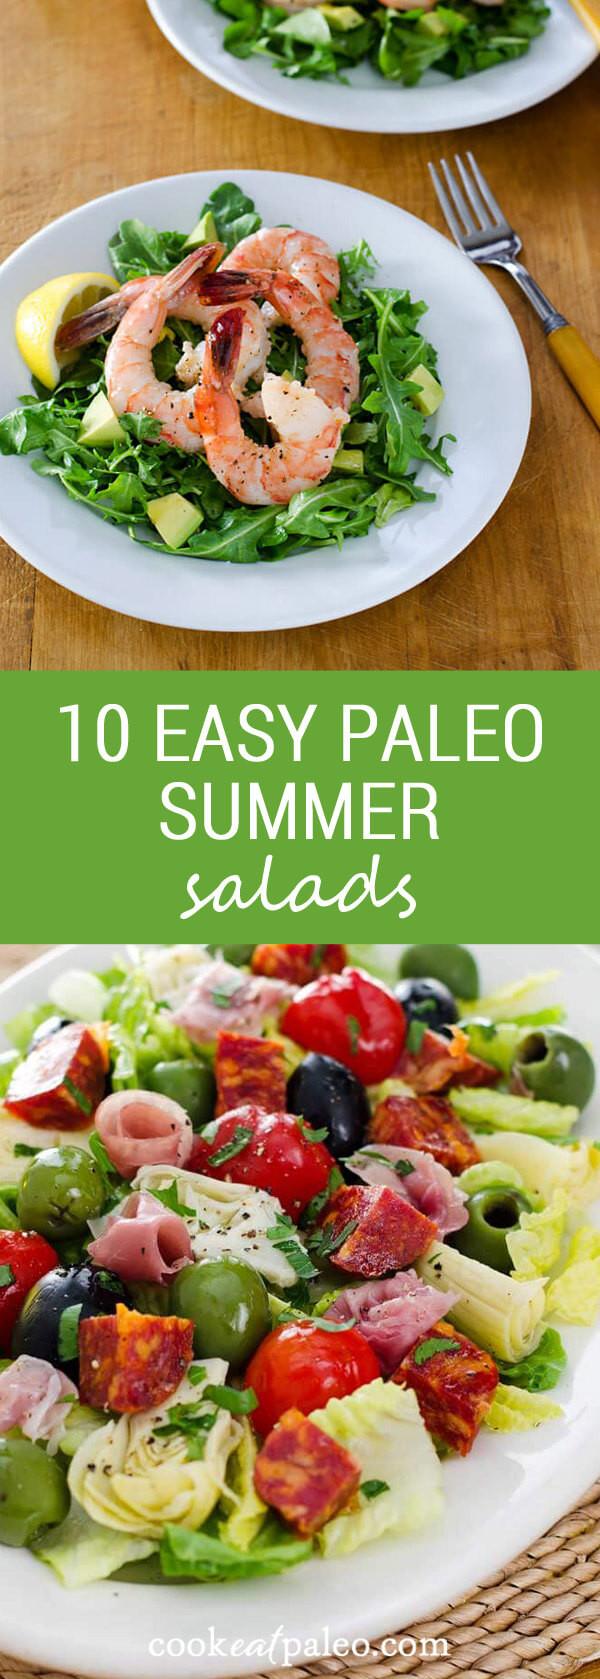 Gluten Free Summer Recipes  10 Easy Paleo Summer Salads